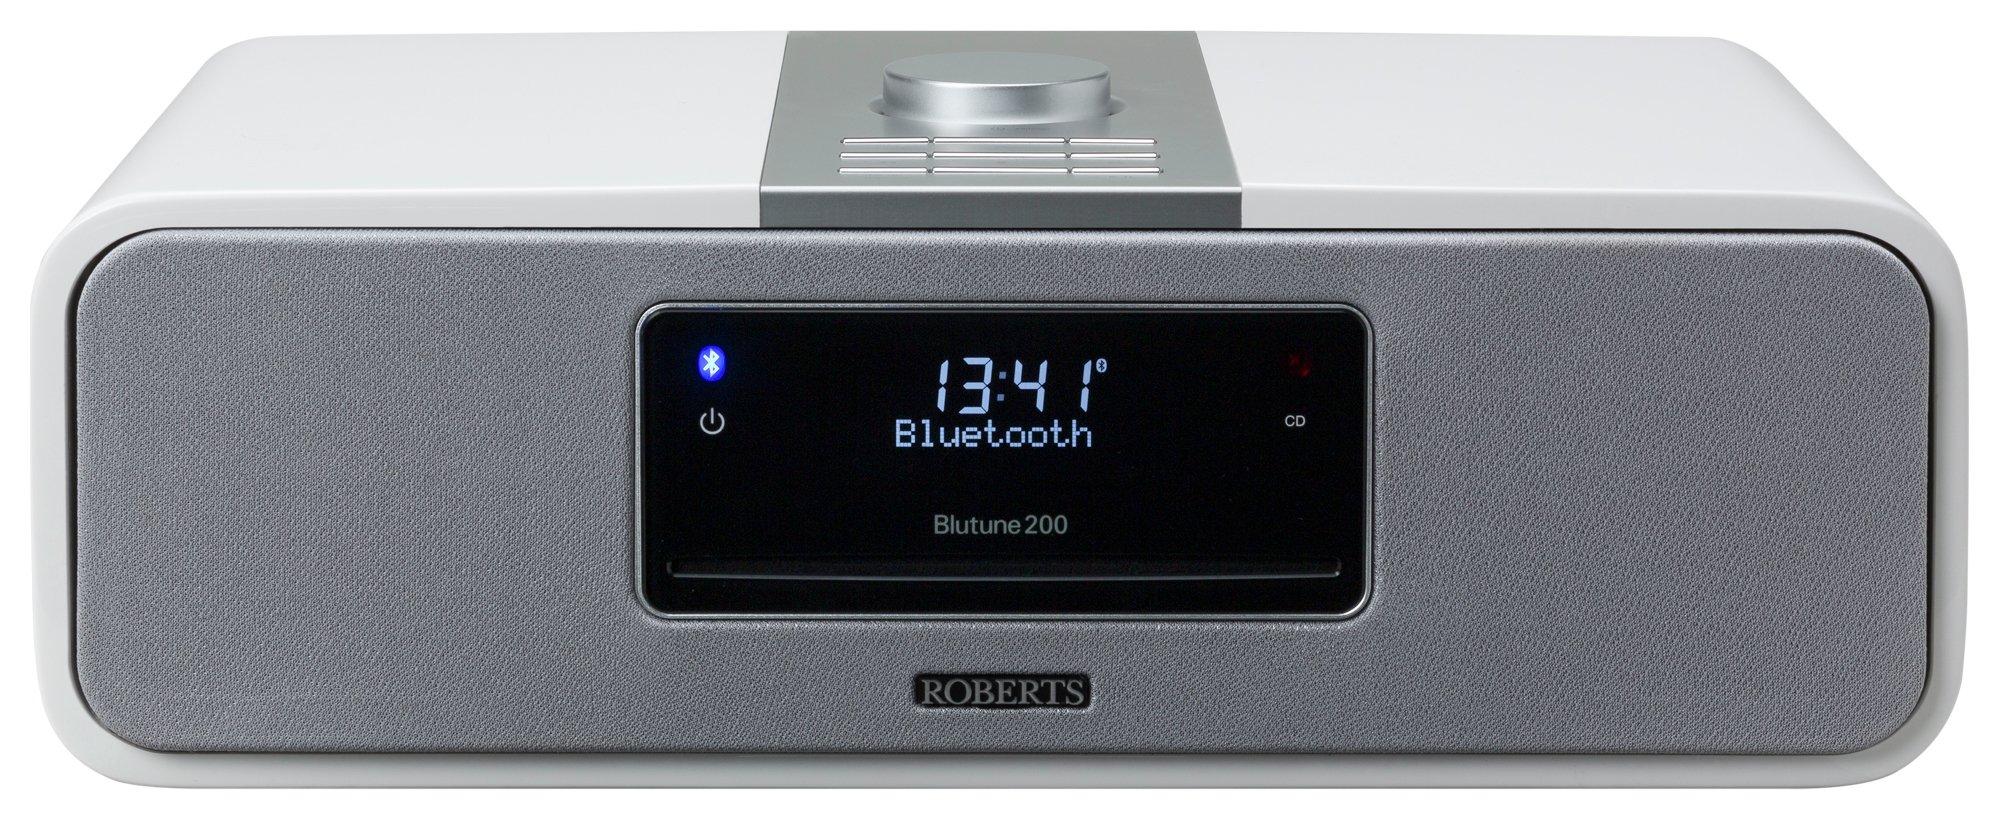 Roberts - Radio Blutune200 Sound System - White